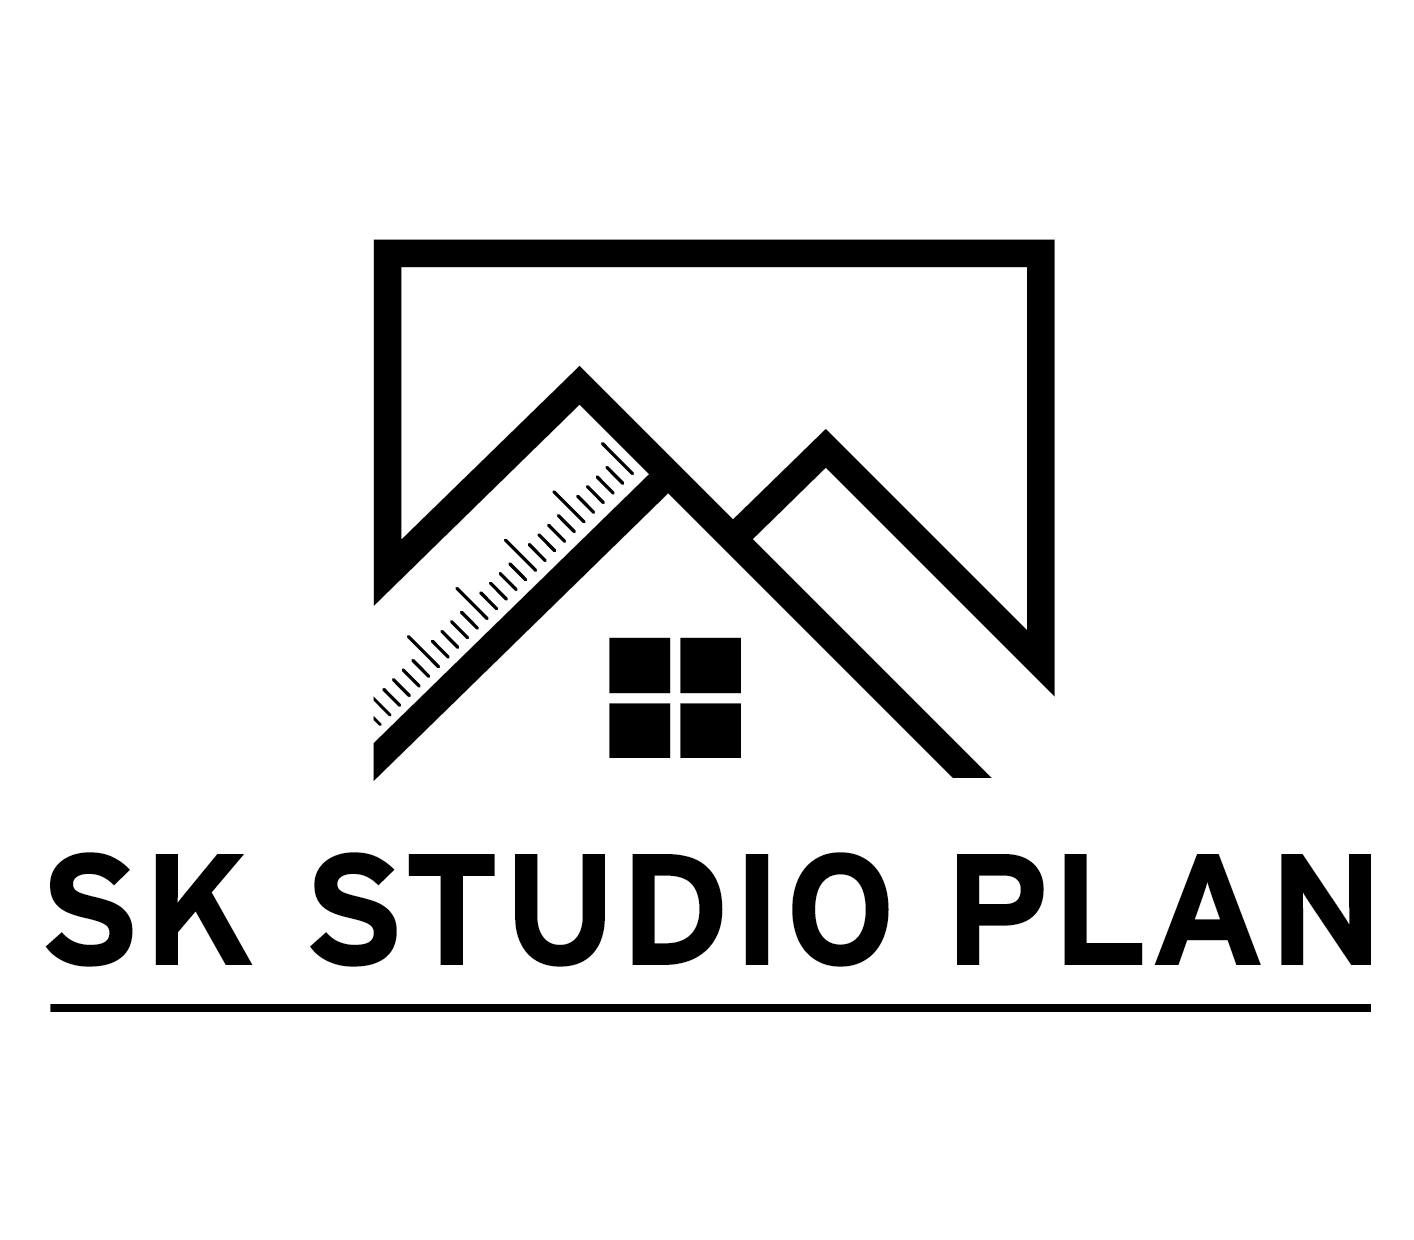 SK Studio Plan